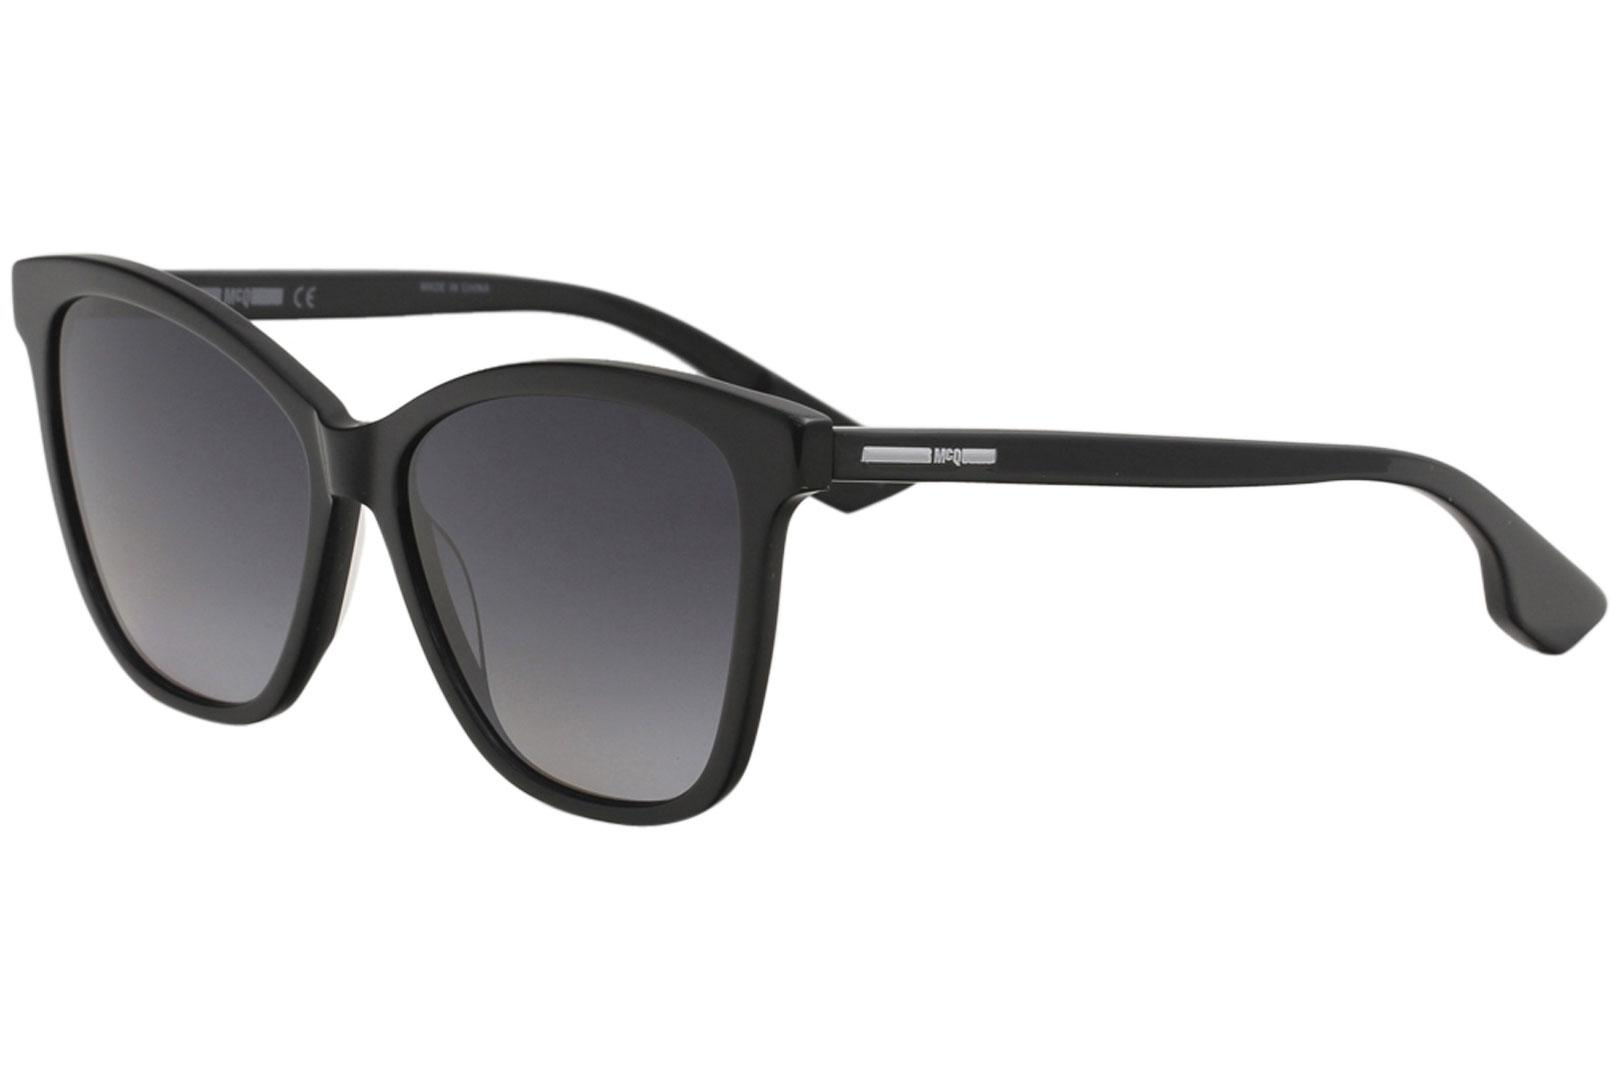 Image of McQ by Alexander McQueen MQ0061S MQ/0061/S 001 Black Butterfly Sunglasses 55mm - Black - Lens 55 Bridge 15 Temple 145mm